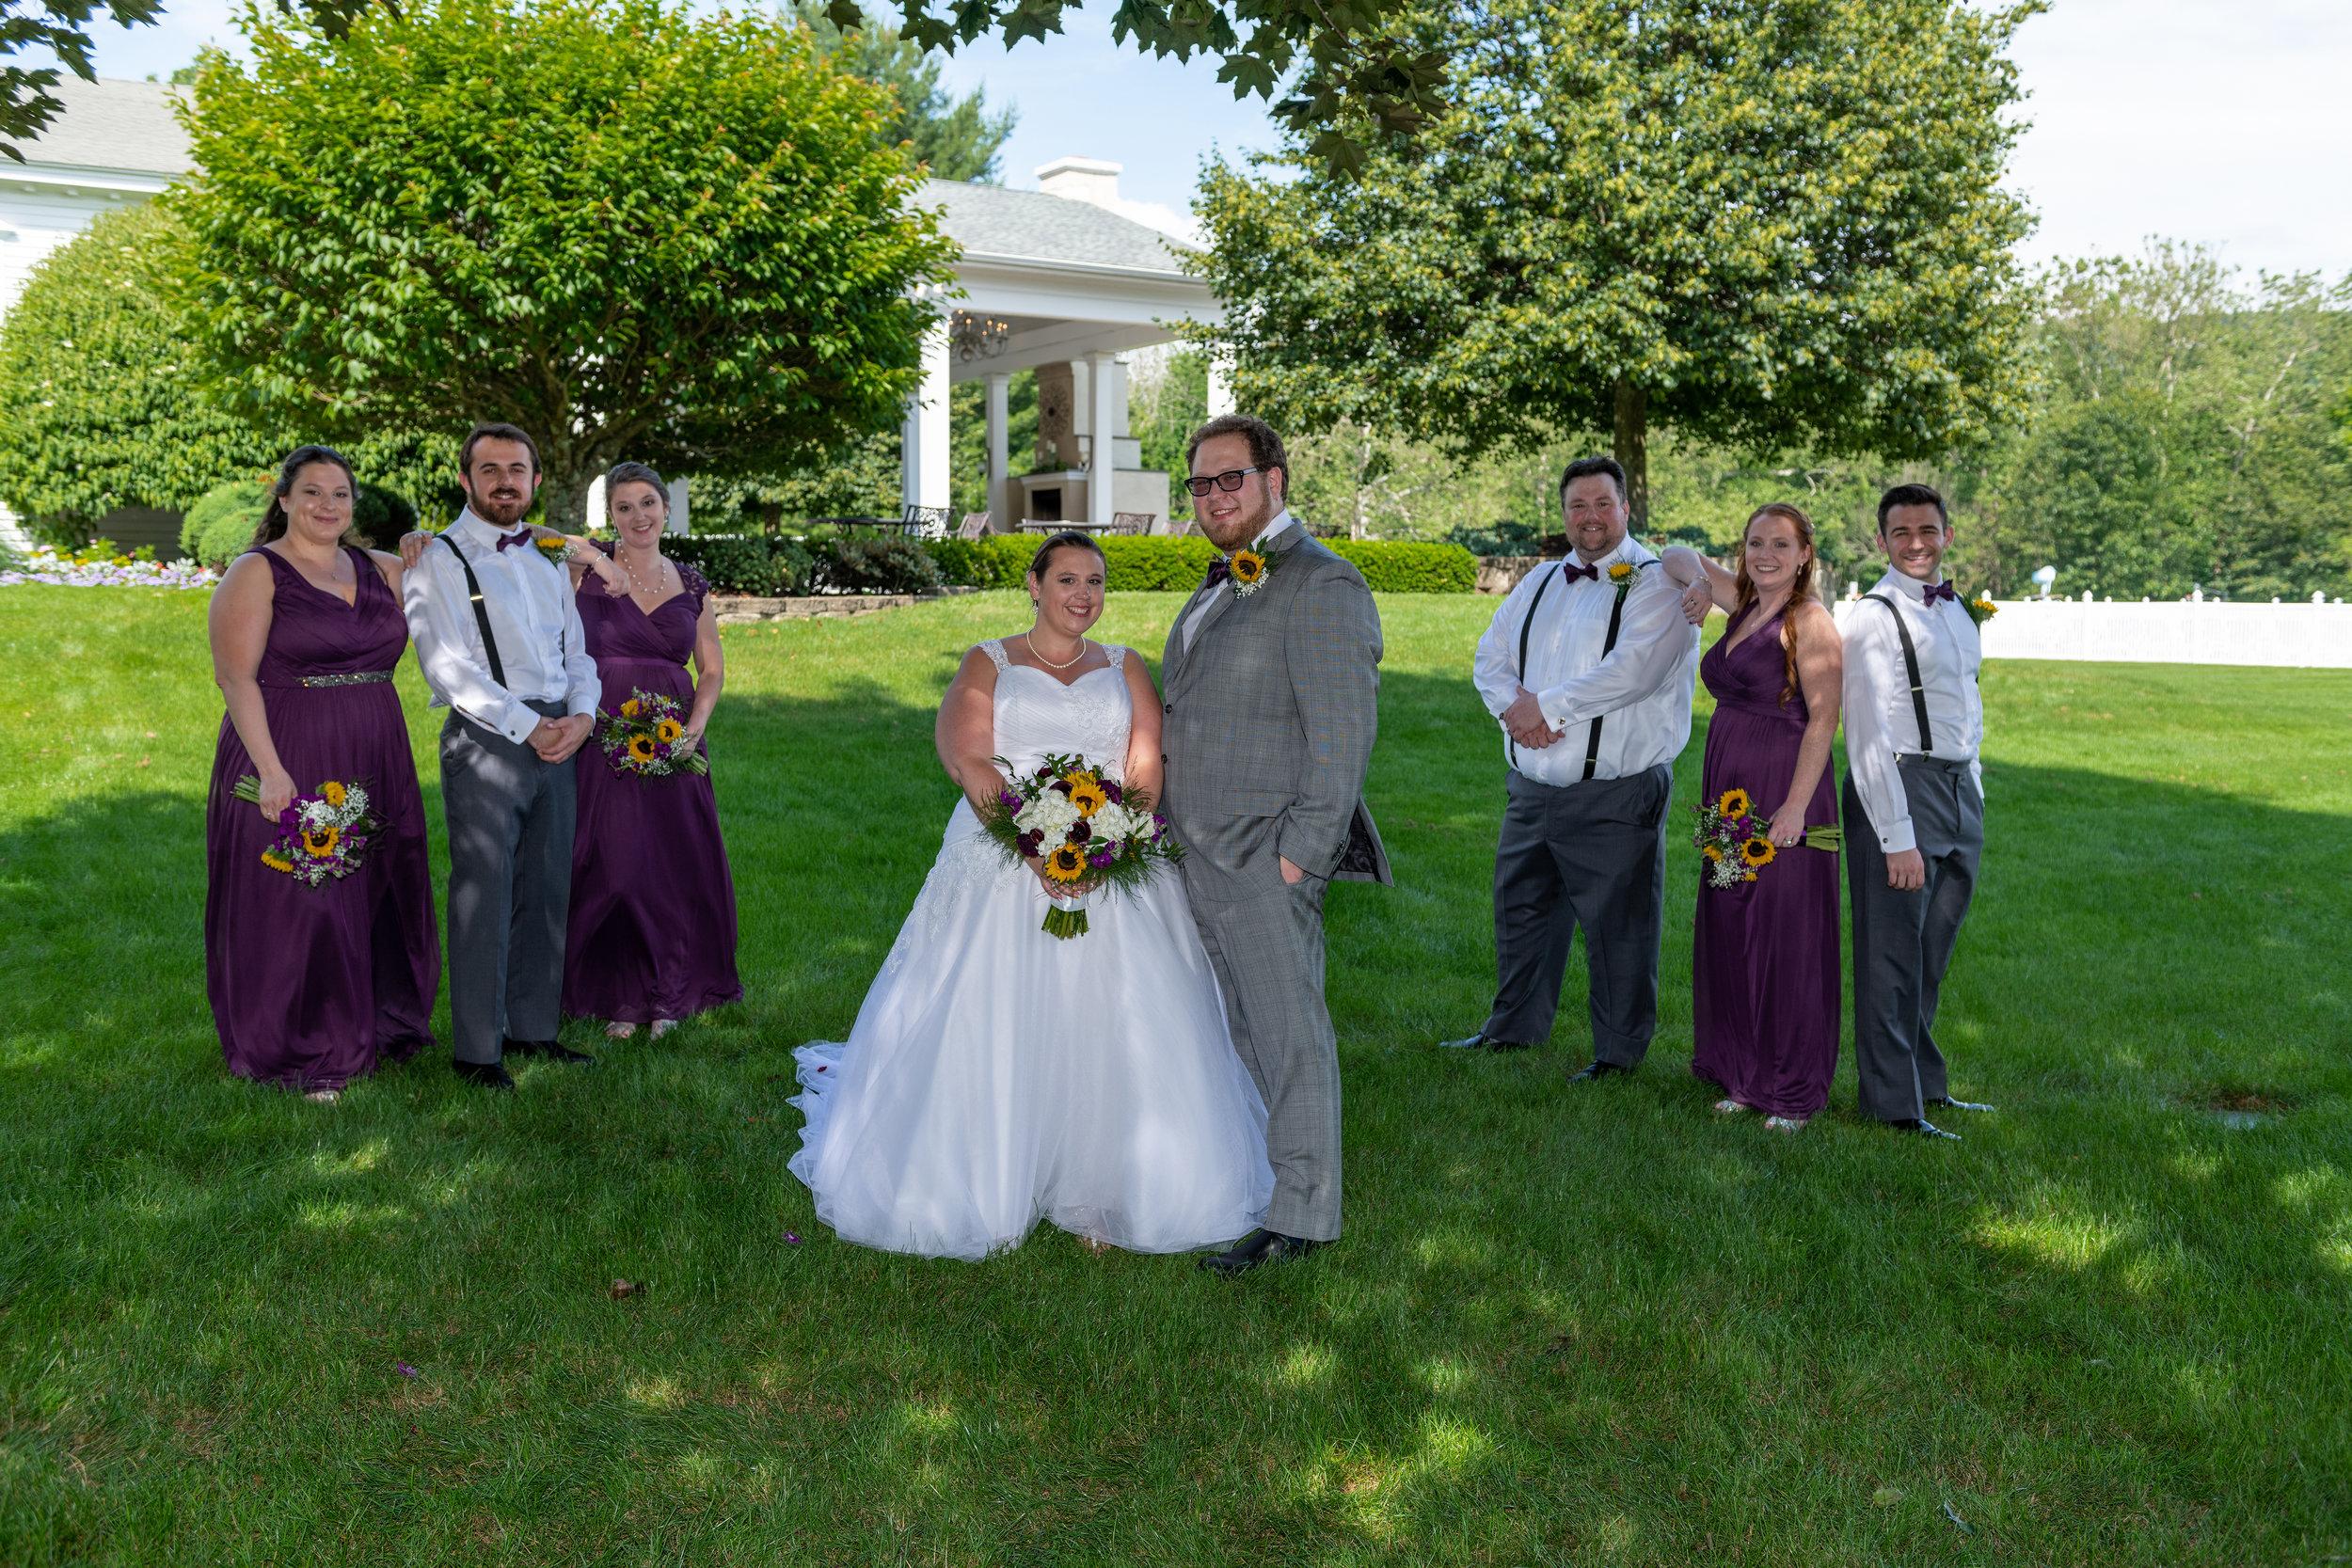 Bridal Party photo at their Farmington Club Wedding